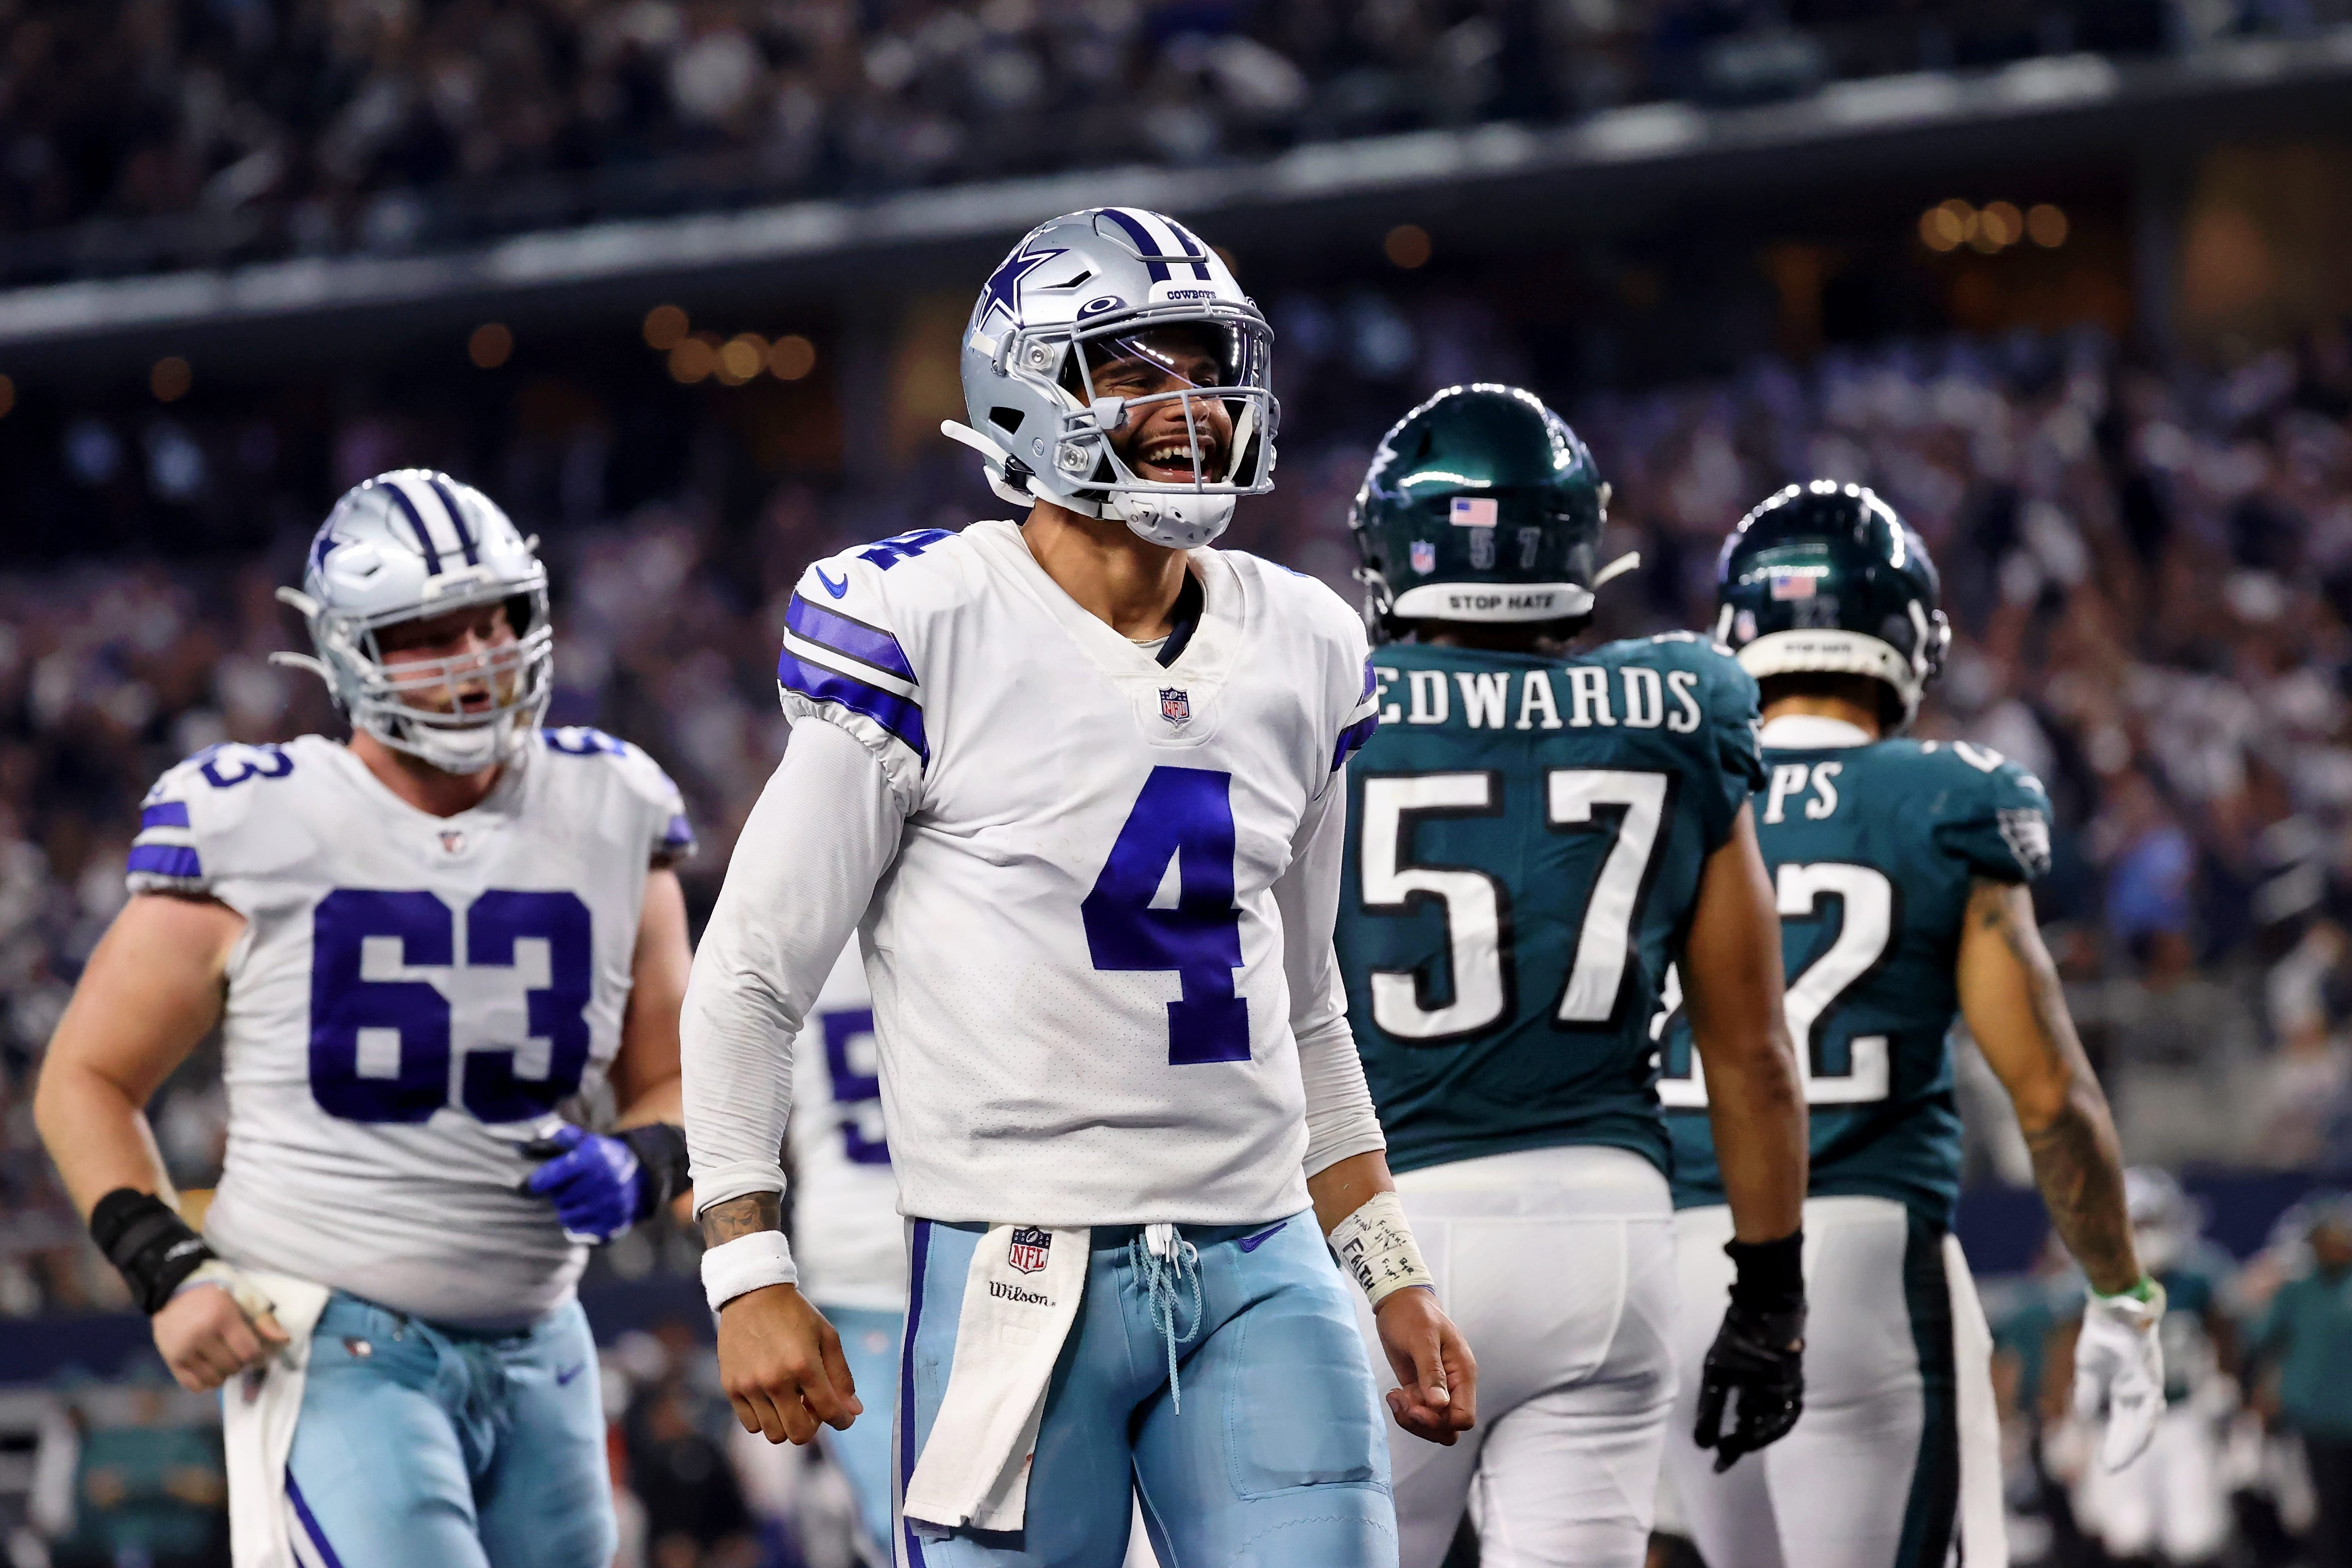 Dak Prescott, Ezekiel Elliott, Trevon Diggs lead Dallas Cowboys to defeat of Philadelphia Eagles on MNF